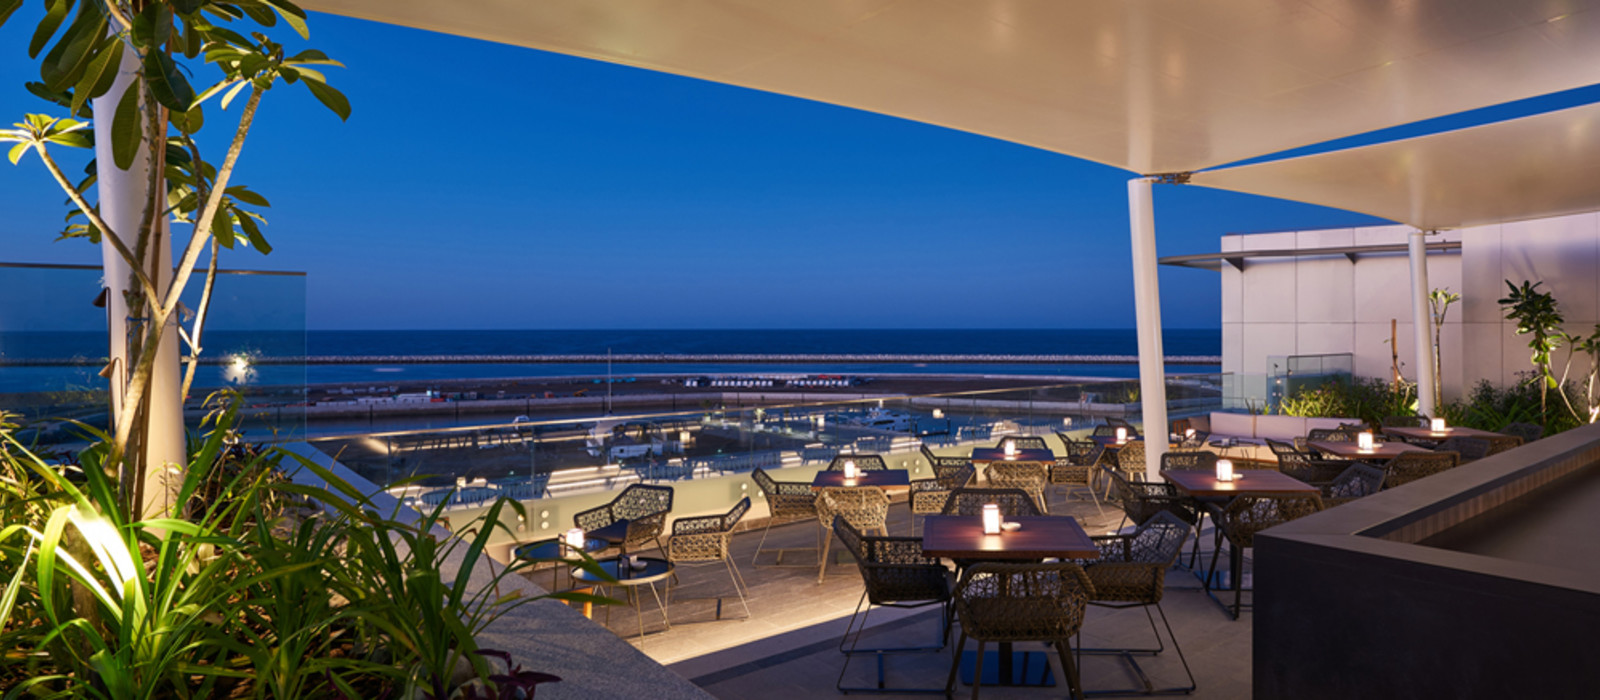 Hotel Mysk Al Mouj by Shaza Oman